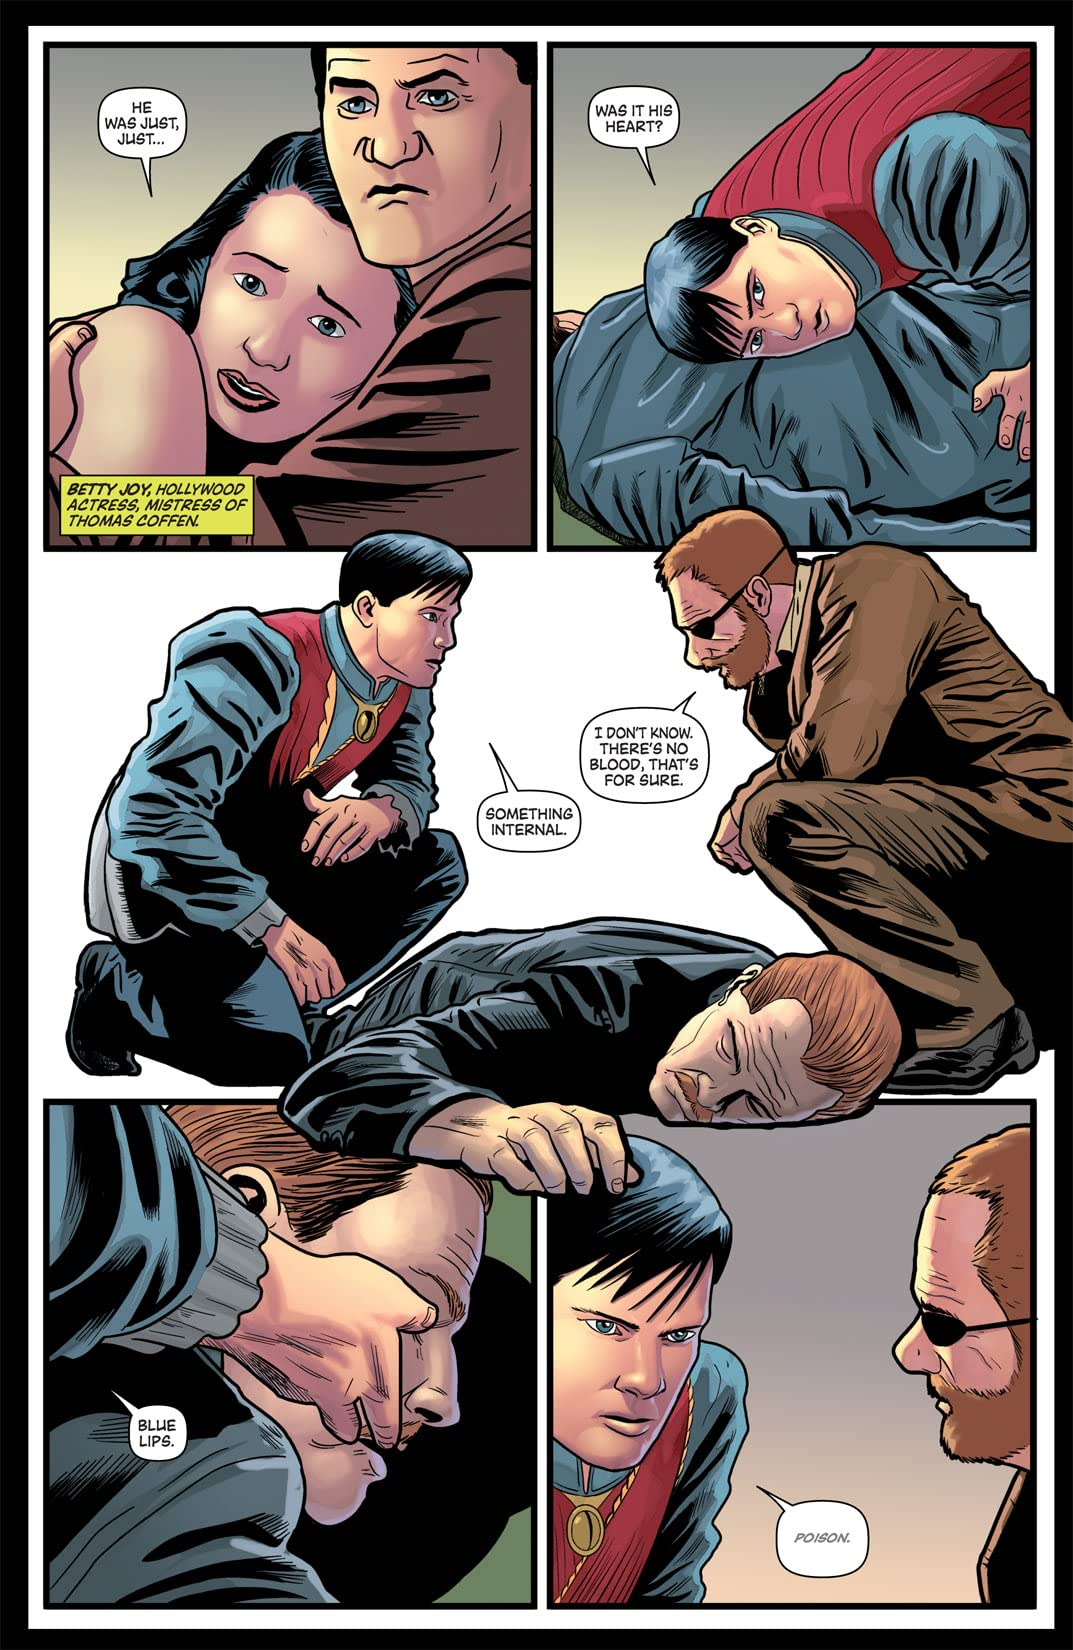 Kato Origins: Way of the Ninja #9